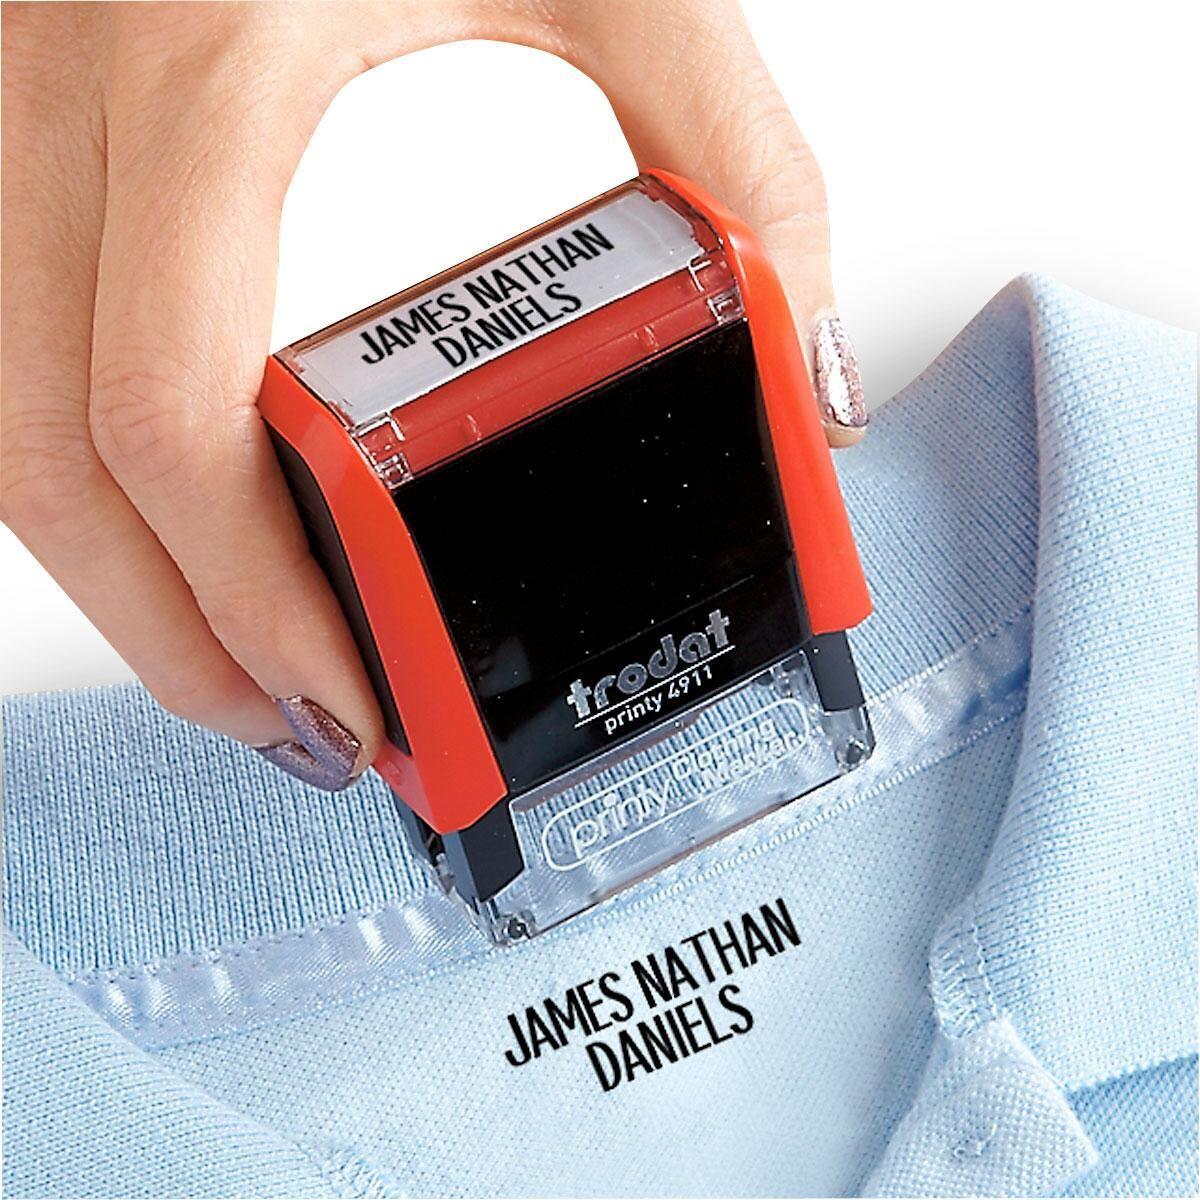 Clothing Stamper